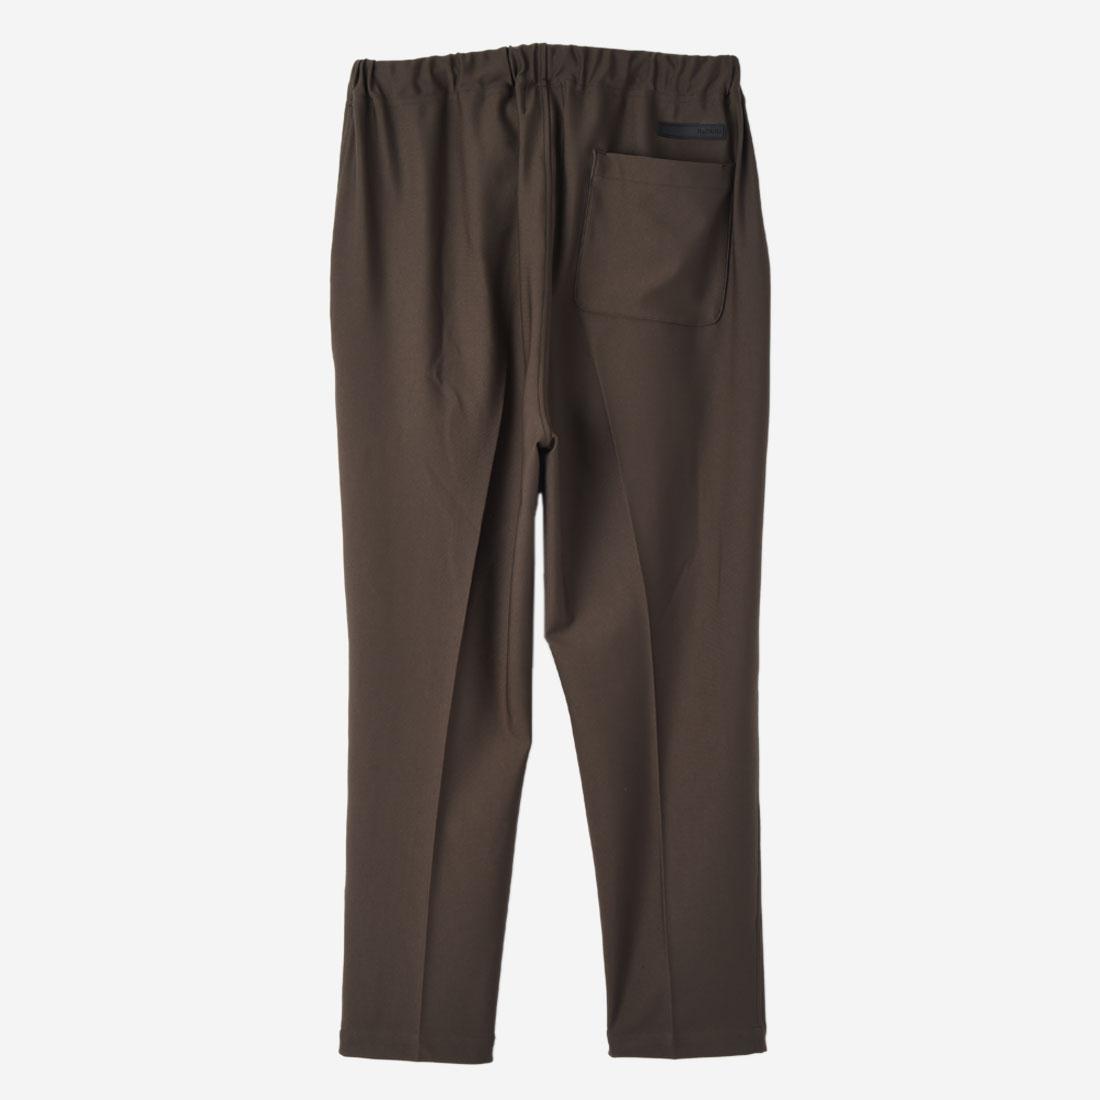 【ReZARD】SETUP No collar Jacket/Cropped Trousers 【新色追加】